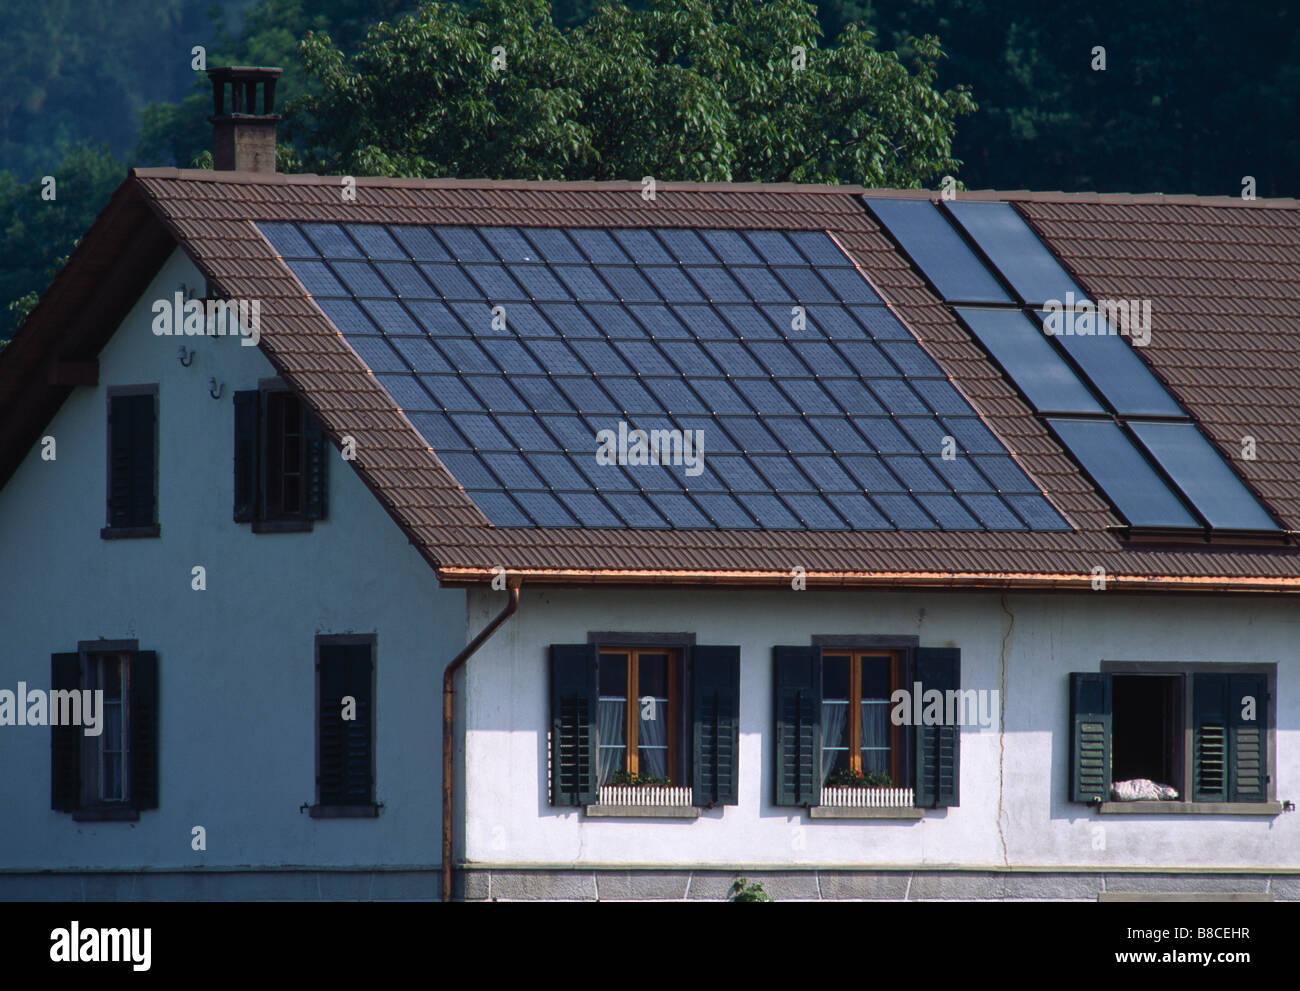 SOLAR TILES & PANELS - Stock Image